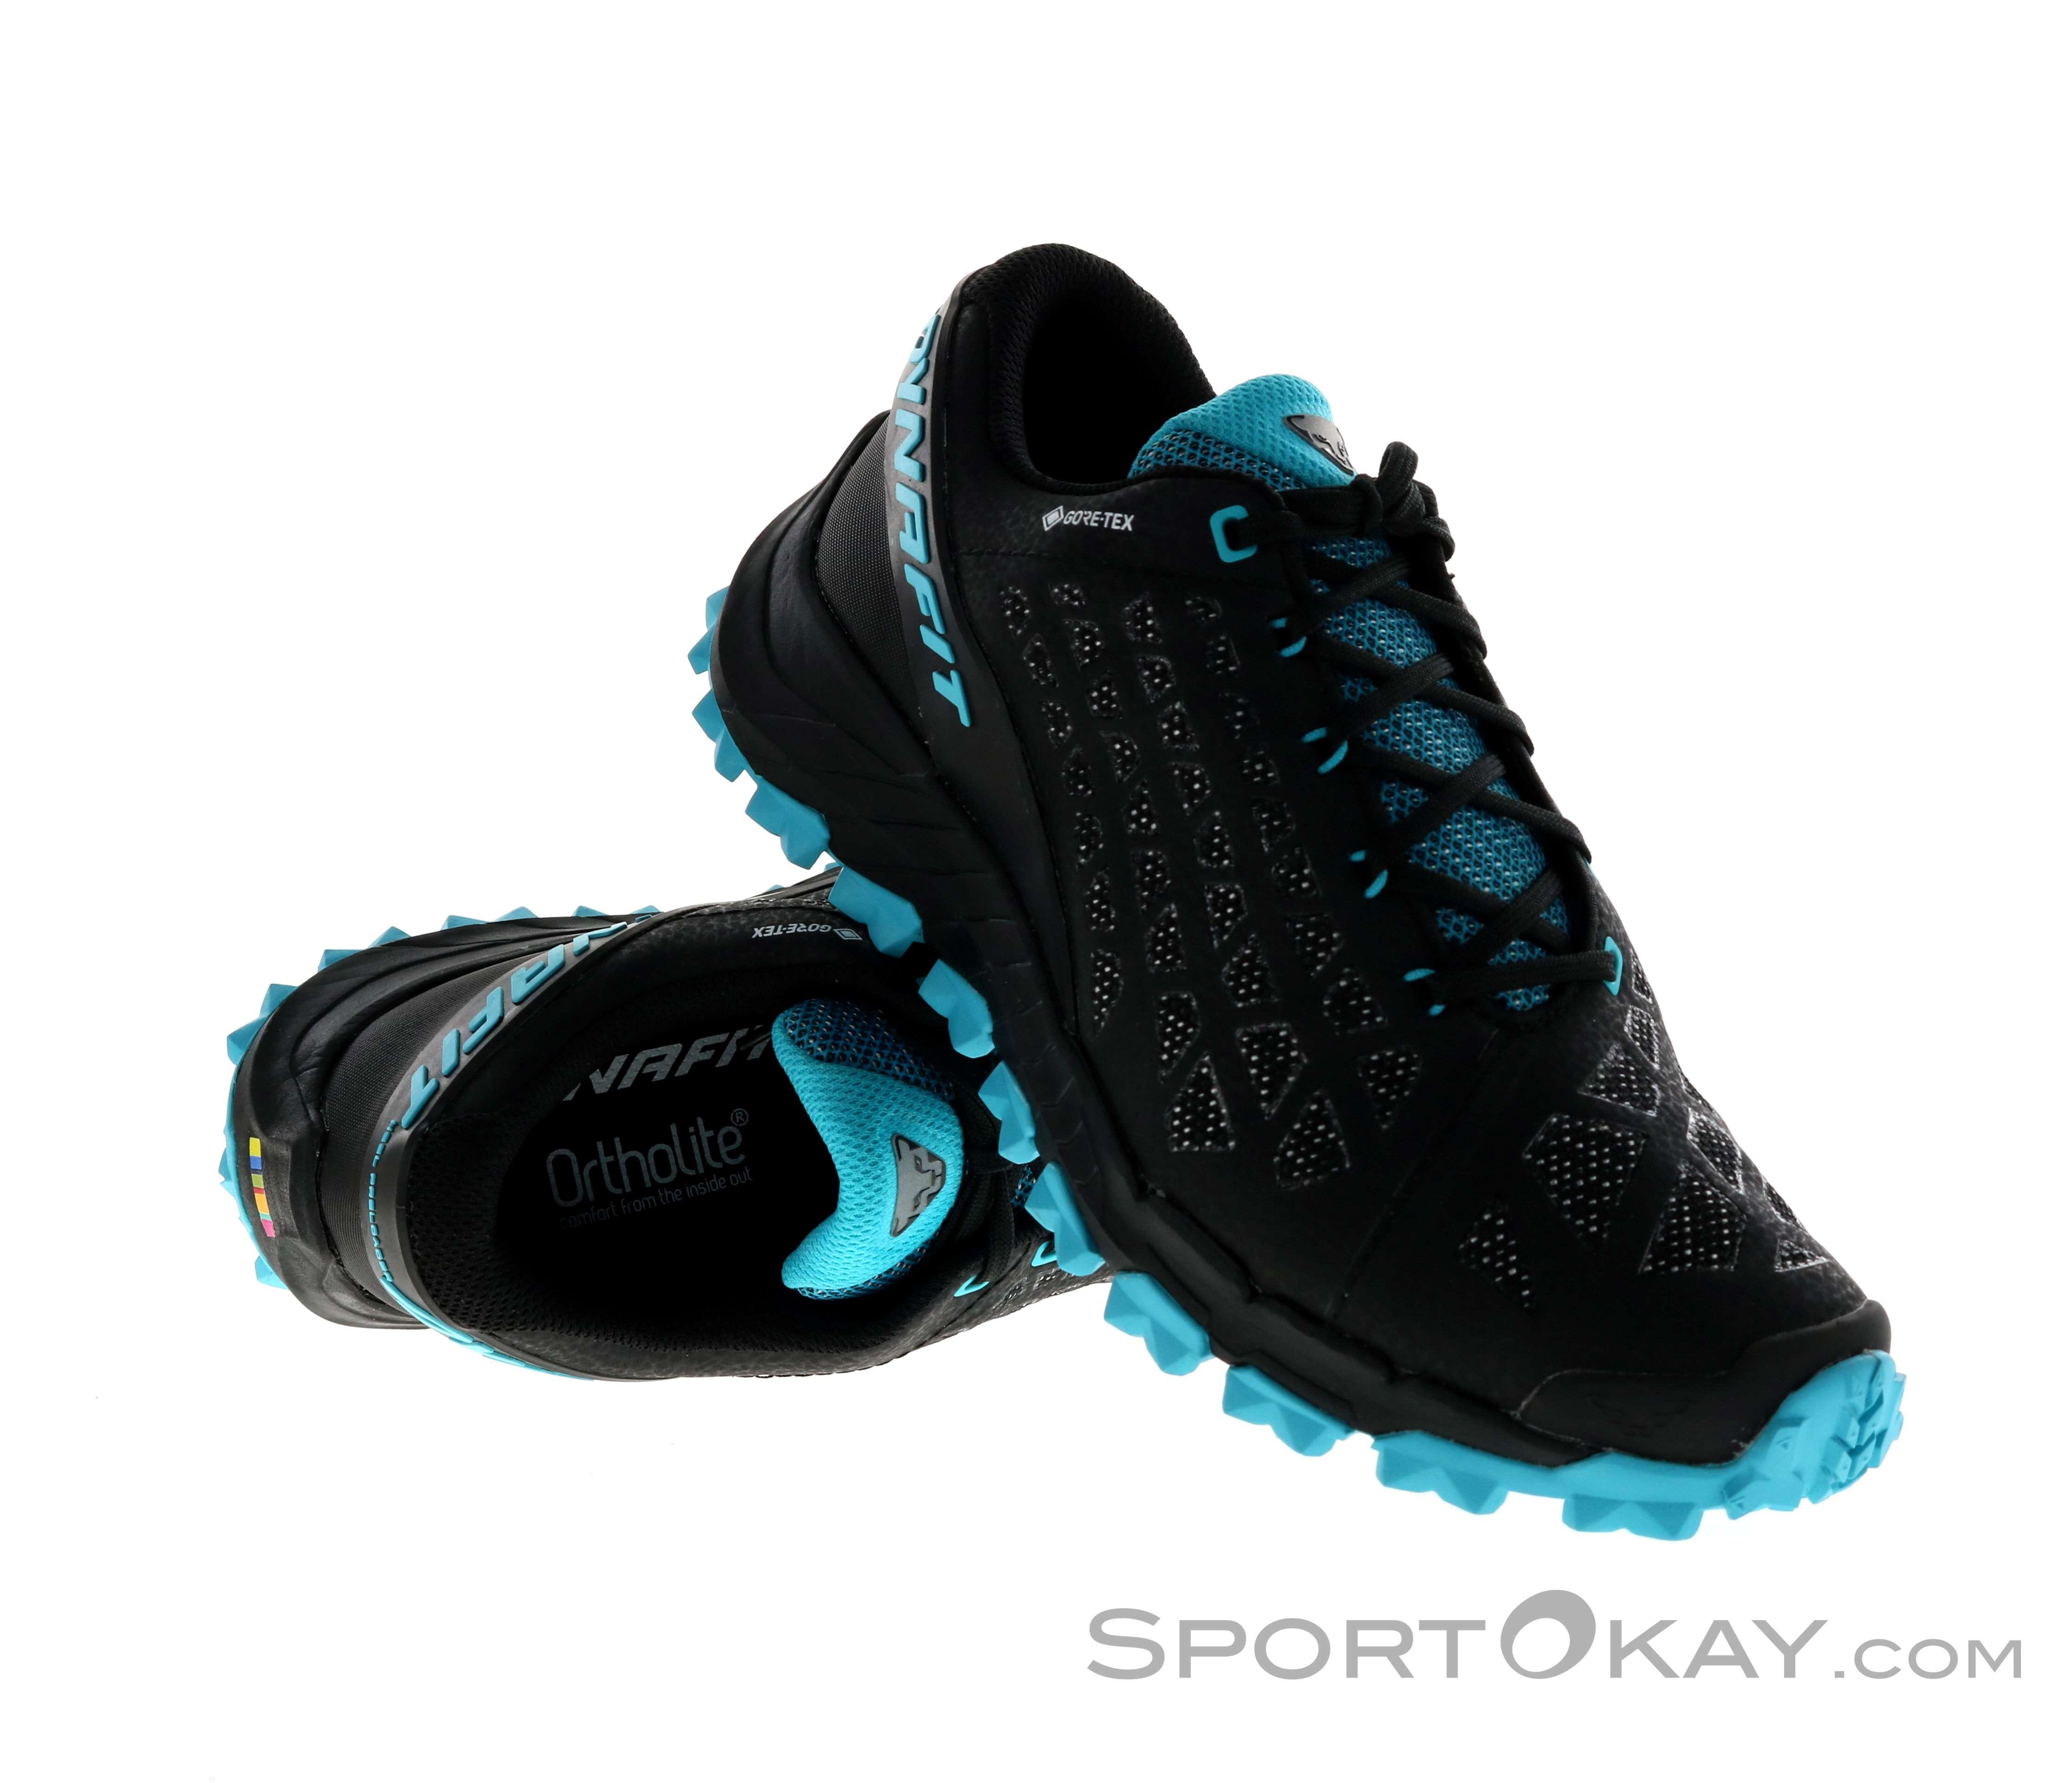 Dynafit Trailbreaker Femmes Chaussures Trail Running Noir